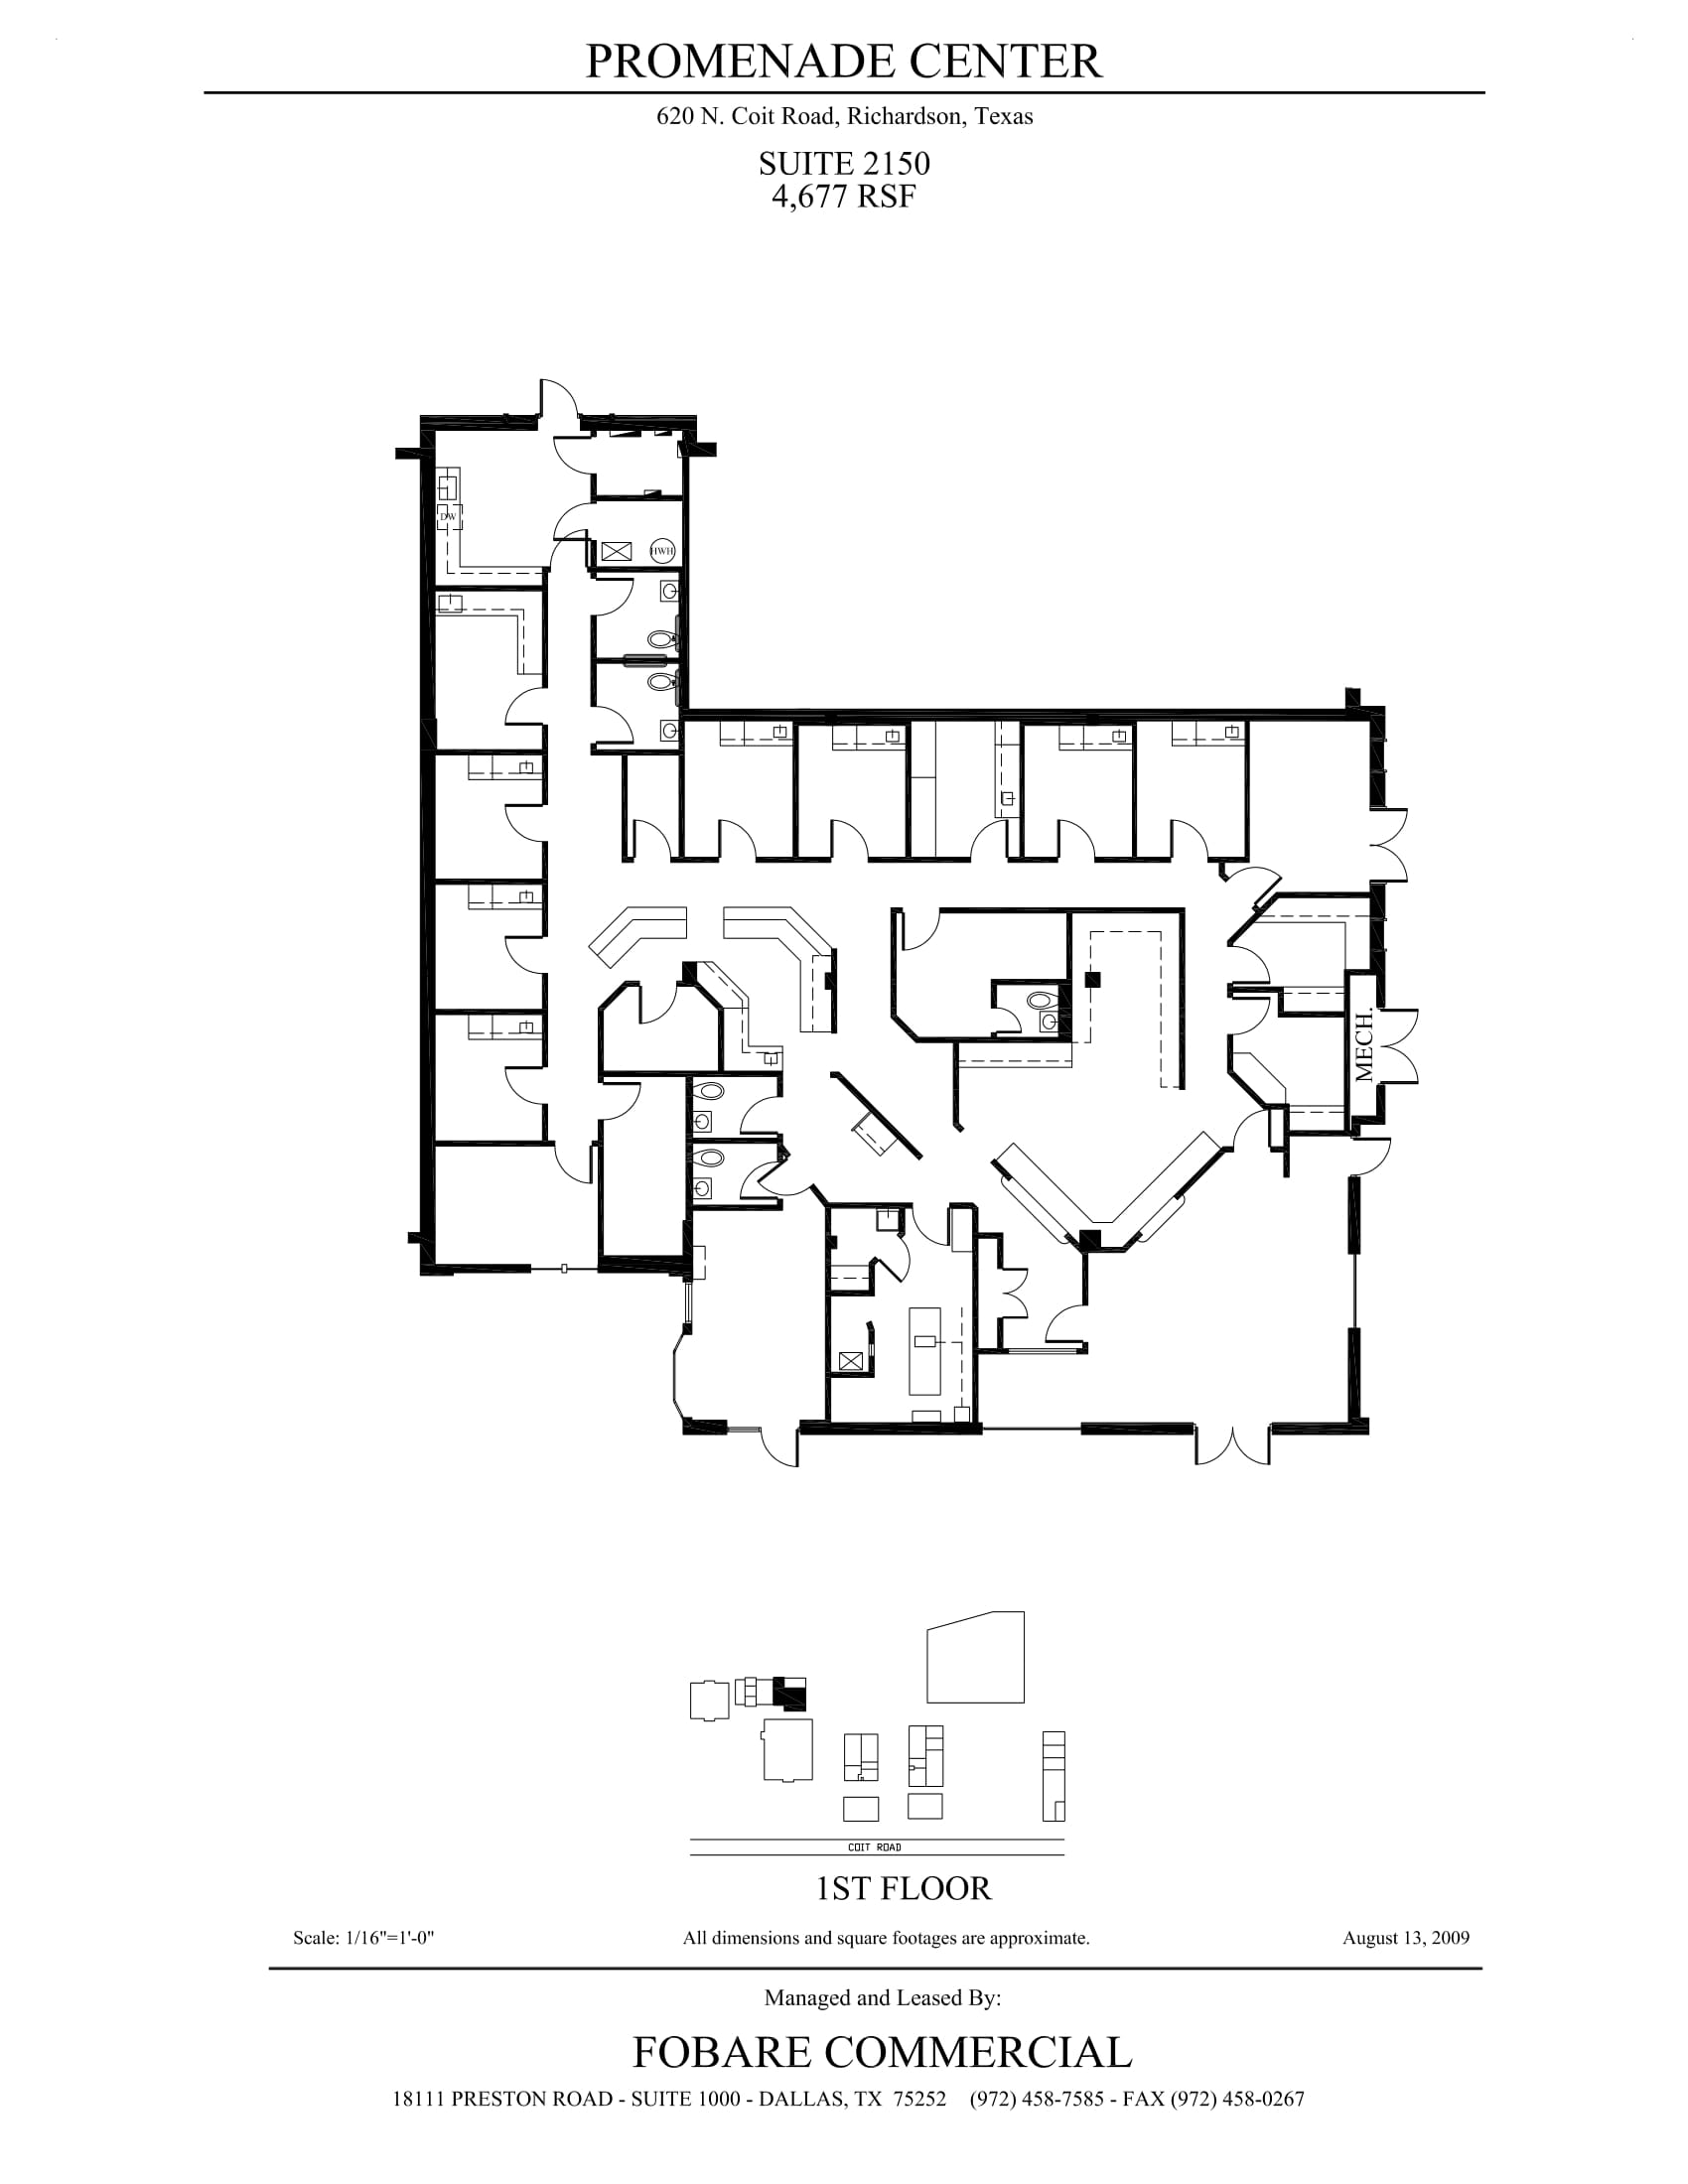 Promenade Center - Suite 2150 - As-built-1